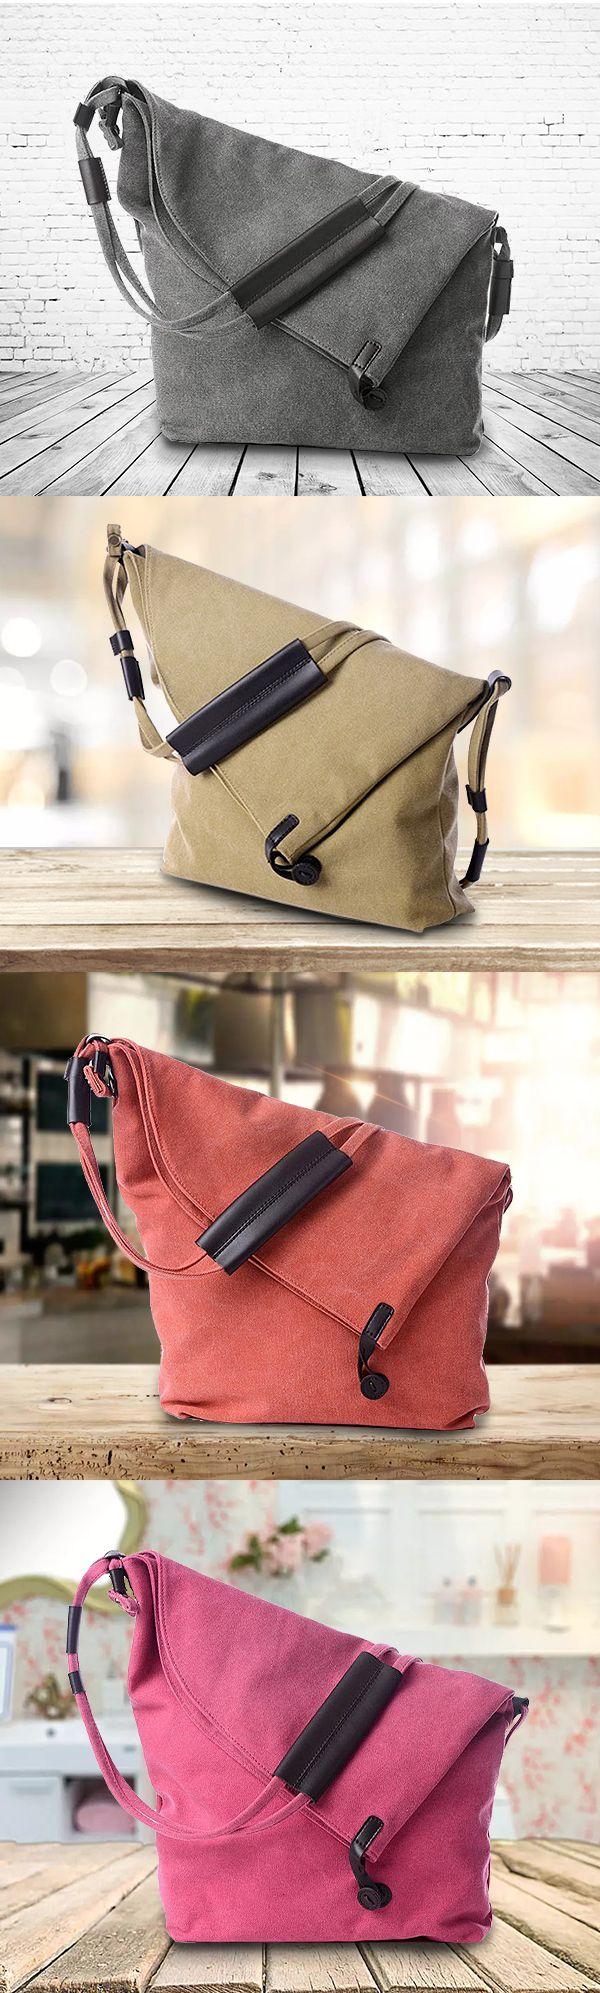 US$23.14 Women Vintage Canvas Casual Large Capacity Crossbody Bags Leisure Retro Shoulder Bags